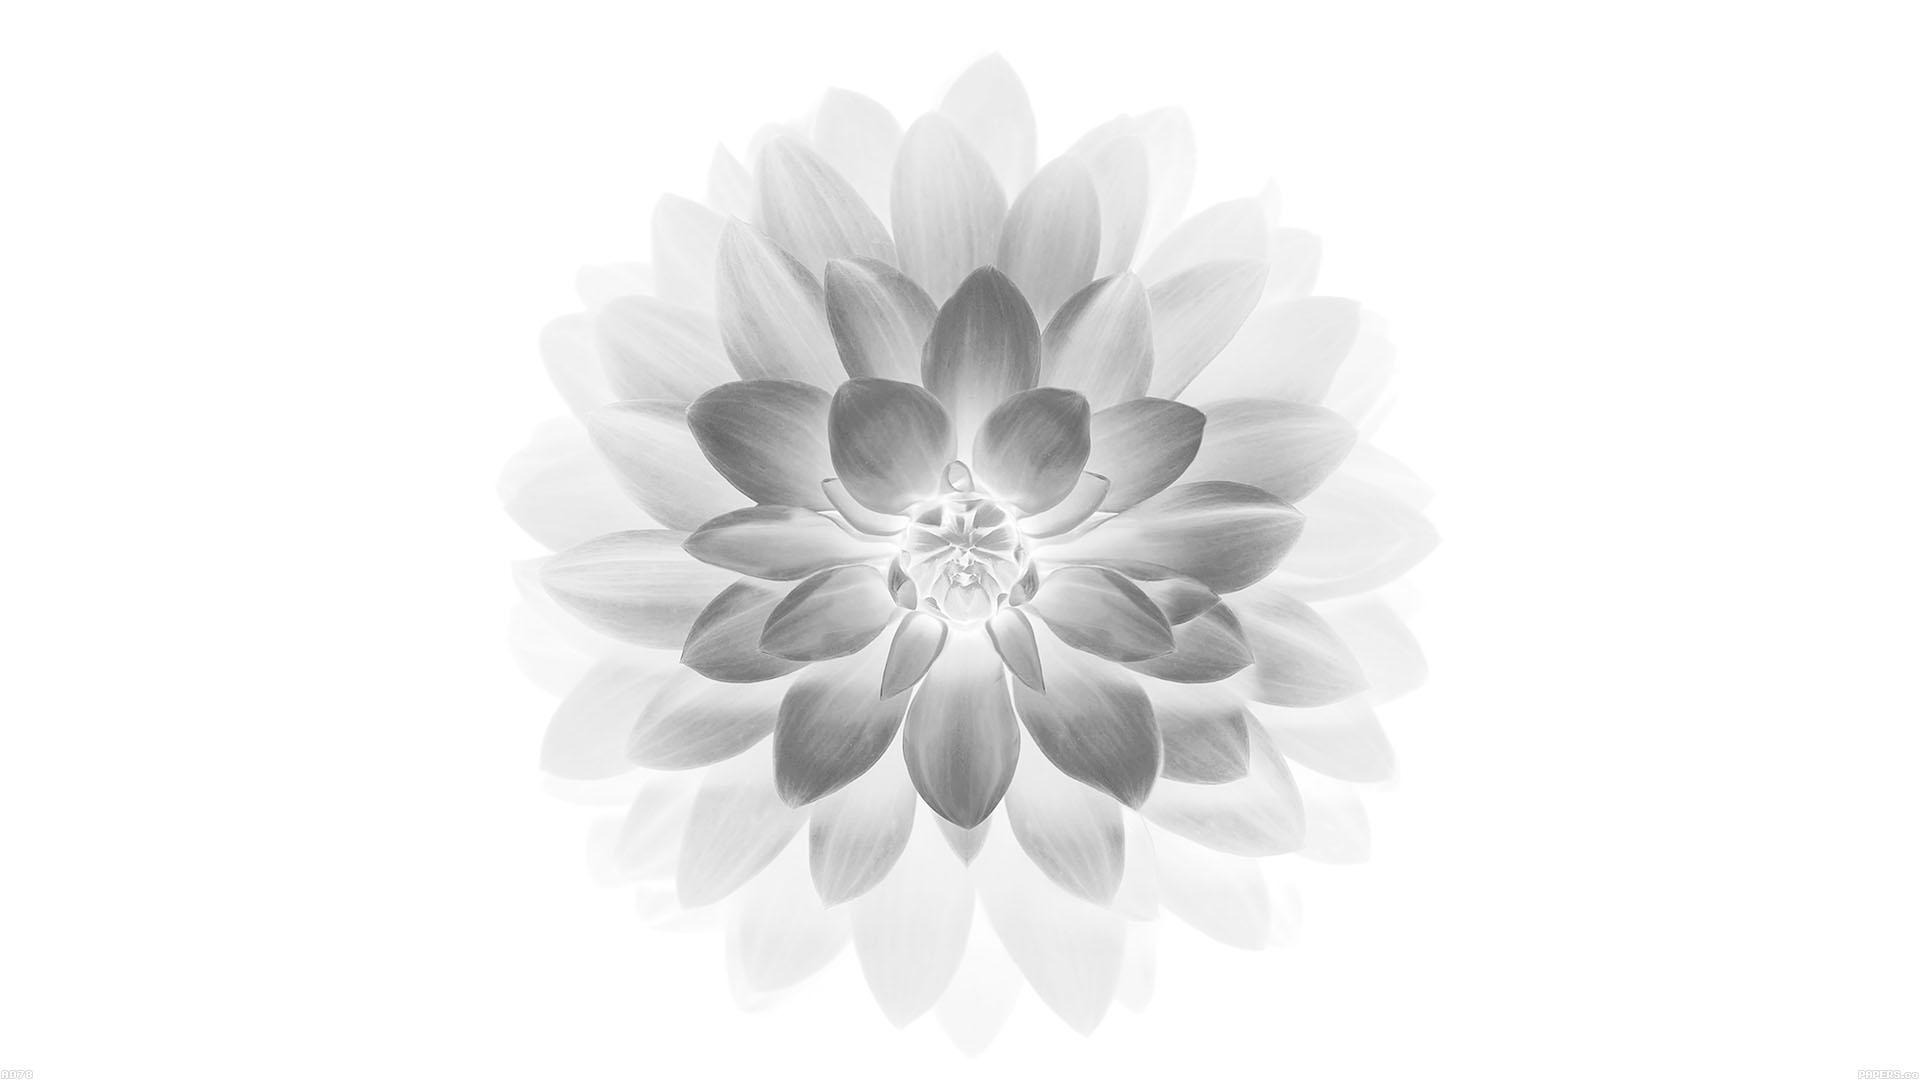 Ac96 Wallpaper Apple Iphone6 Plus Ios8 Flower Green: Ad78-apple-white-lotus-iphone6-plus-ios8-flower